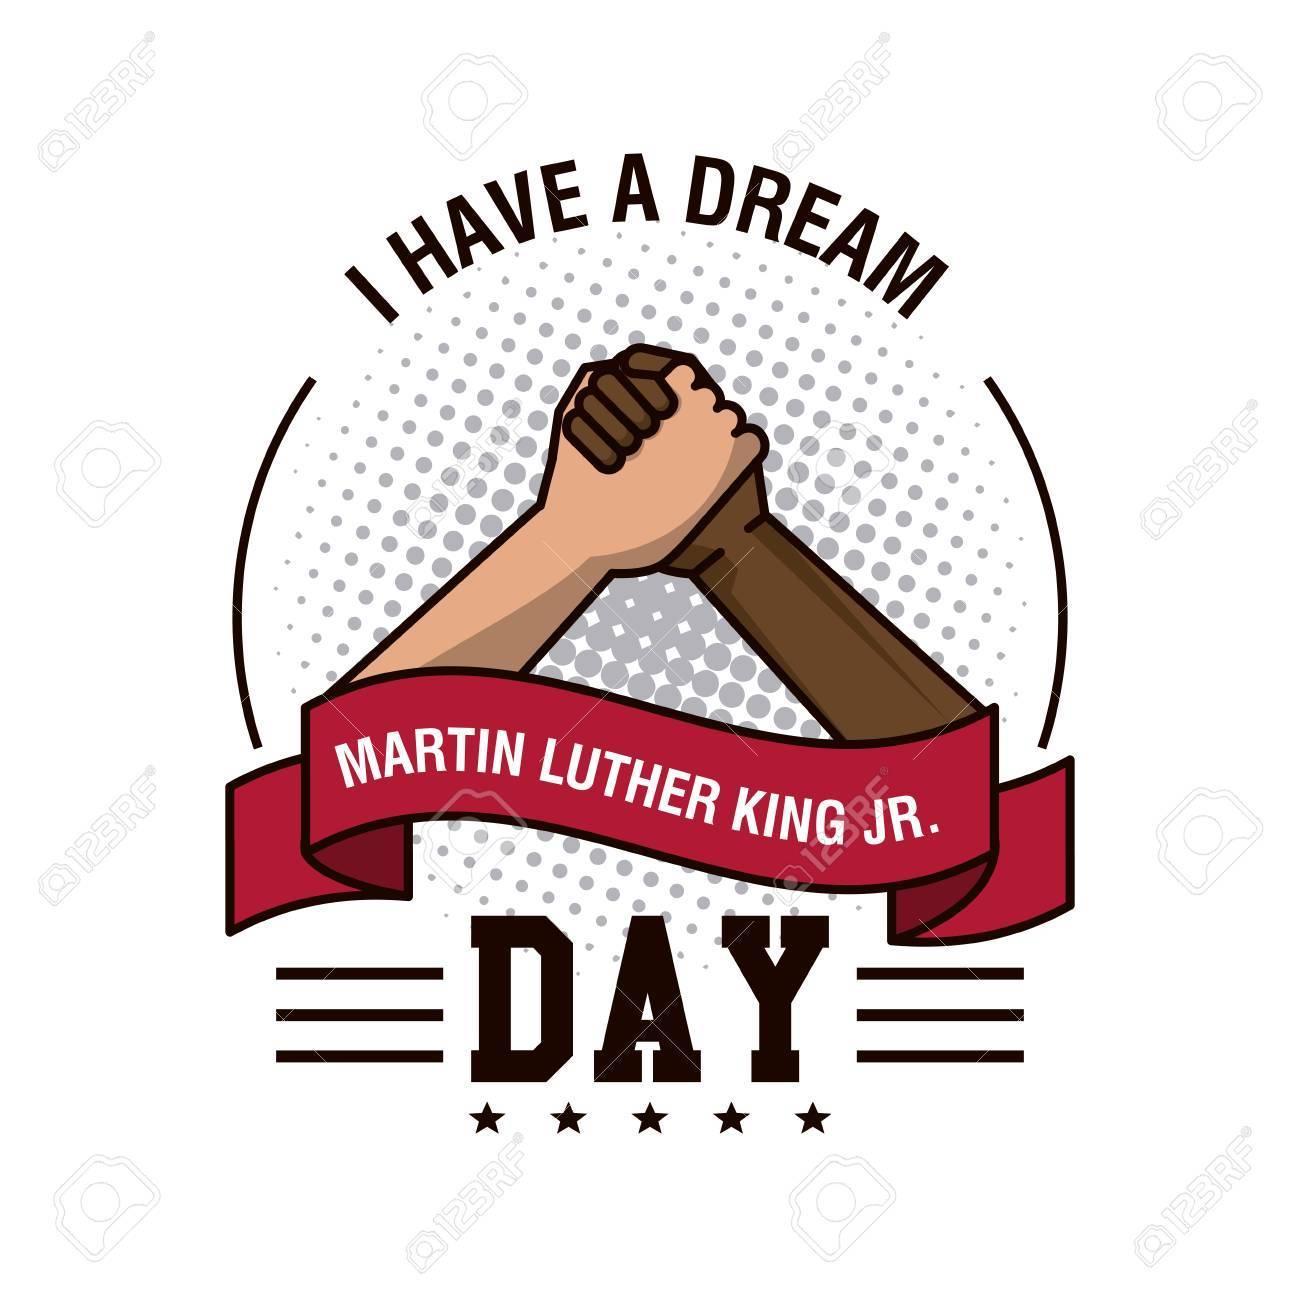 Mlk jr day clipart clip freeuse download Martin luther king JR day » Clipart Portal clip freeuse download